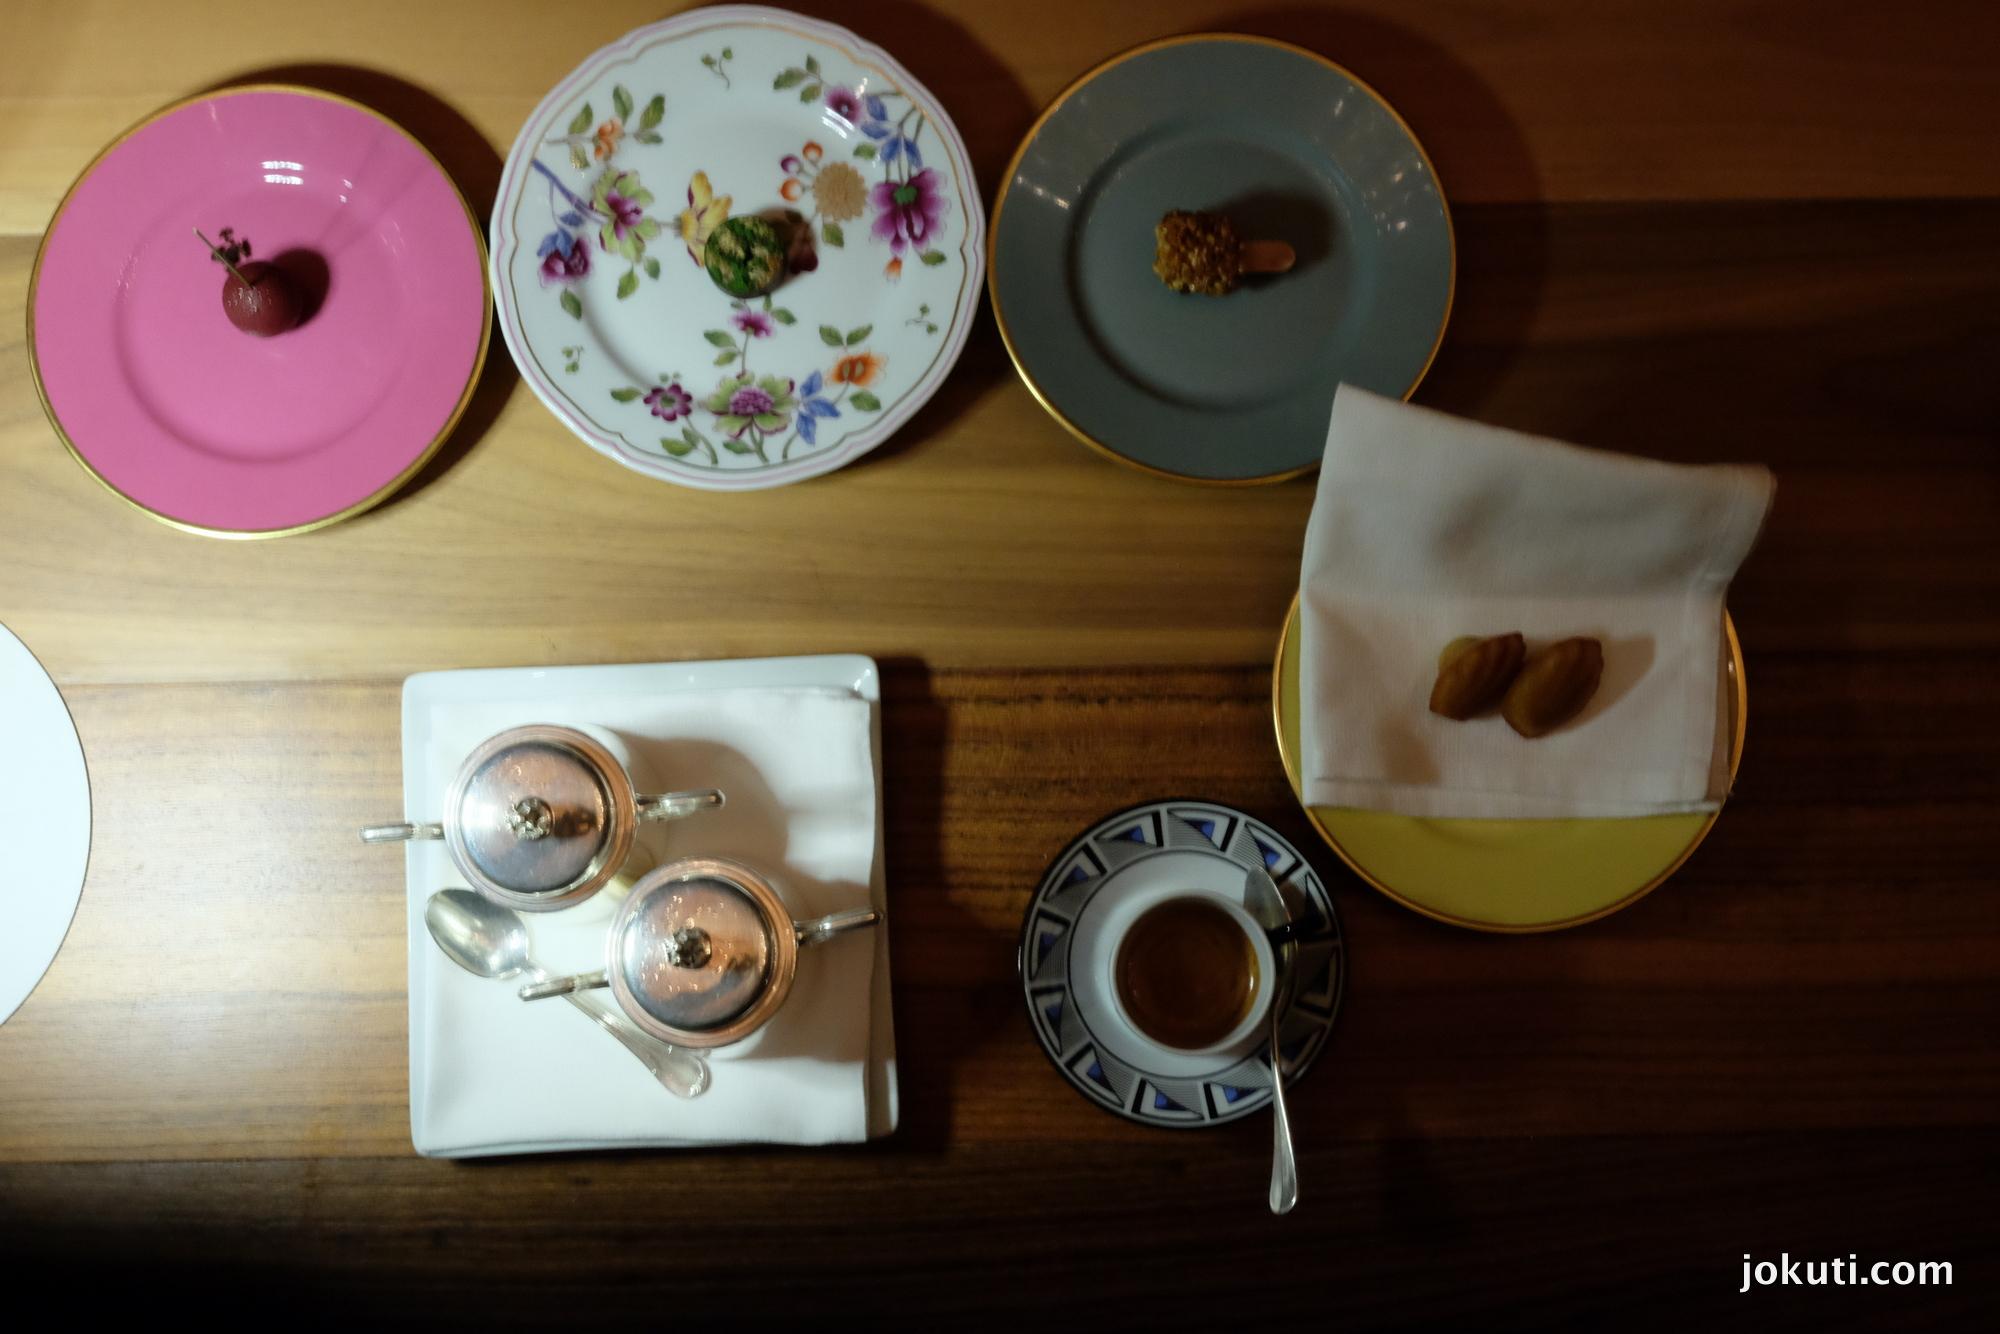 dscf5474_osteria_francescana_modena_italy_massimo_bottura_michelin_reitbauer_restaurant_vilagevo_jokuti.jpg